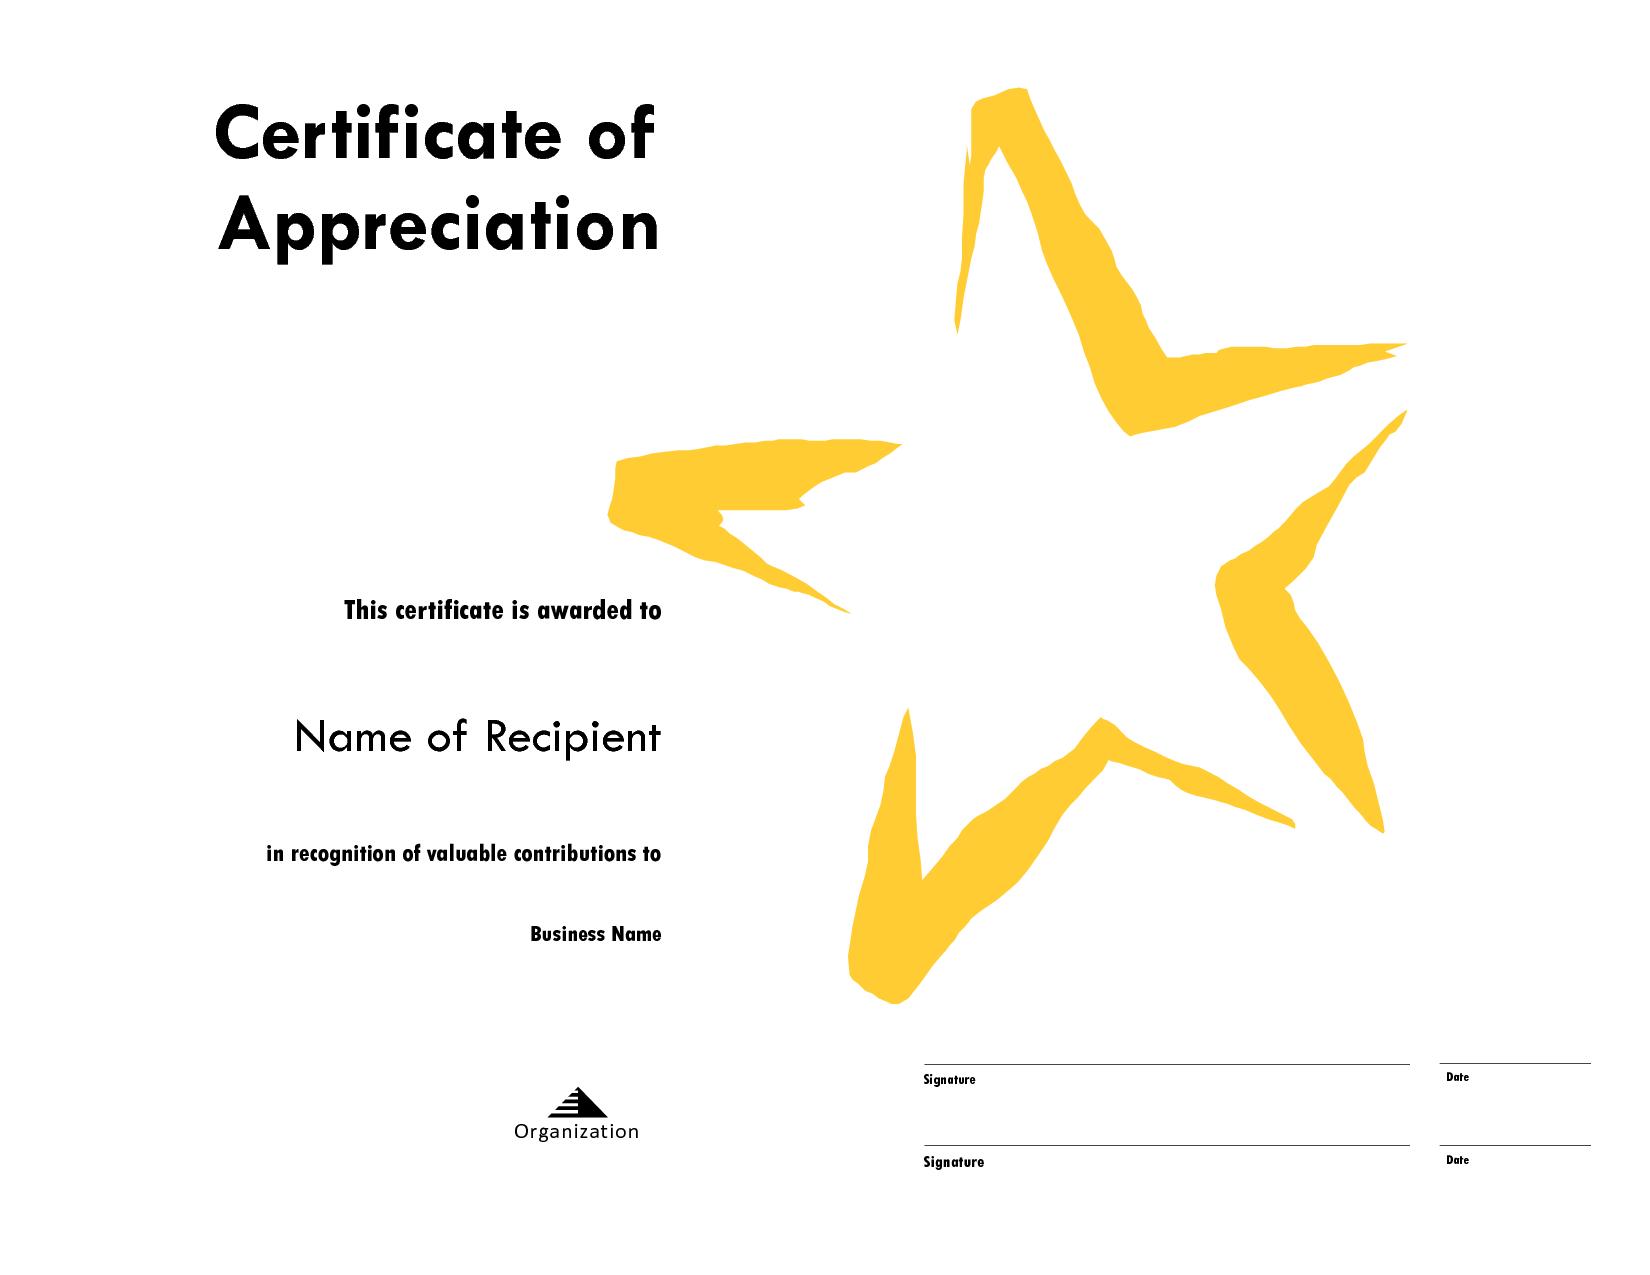 Star Award Certificate Templates Free Image Intended For Star Certificate Templates Free